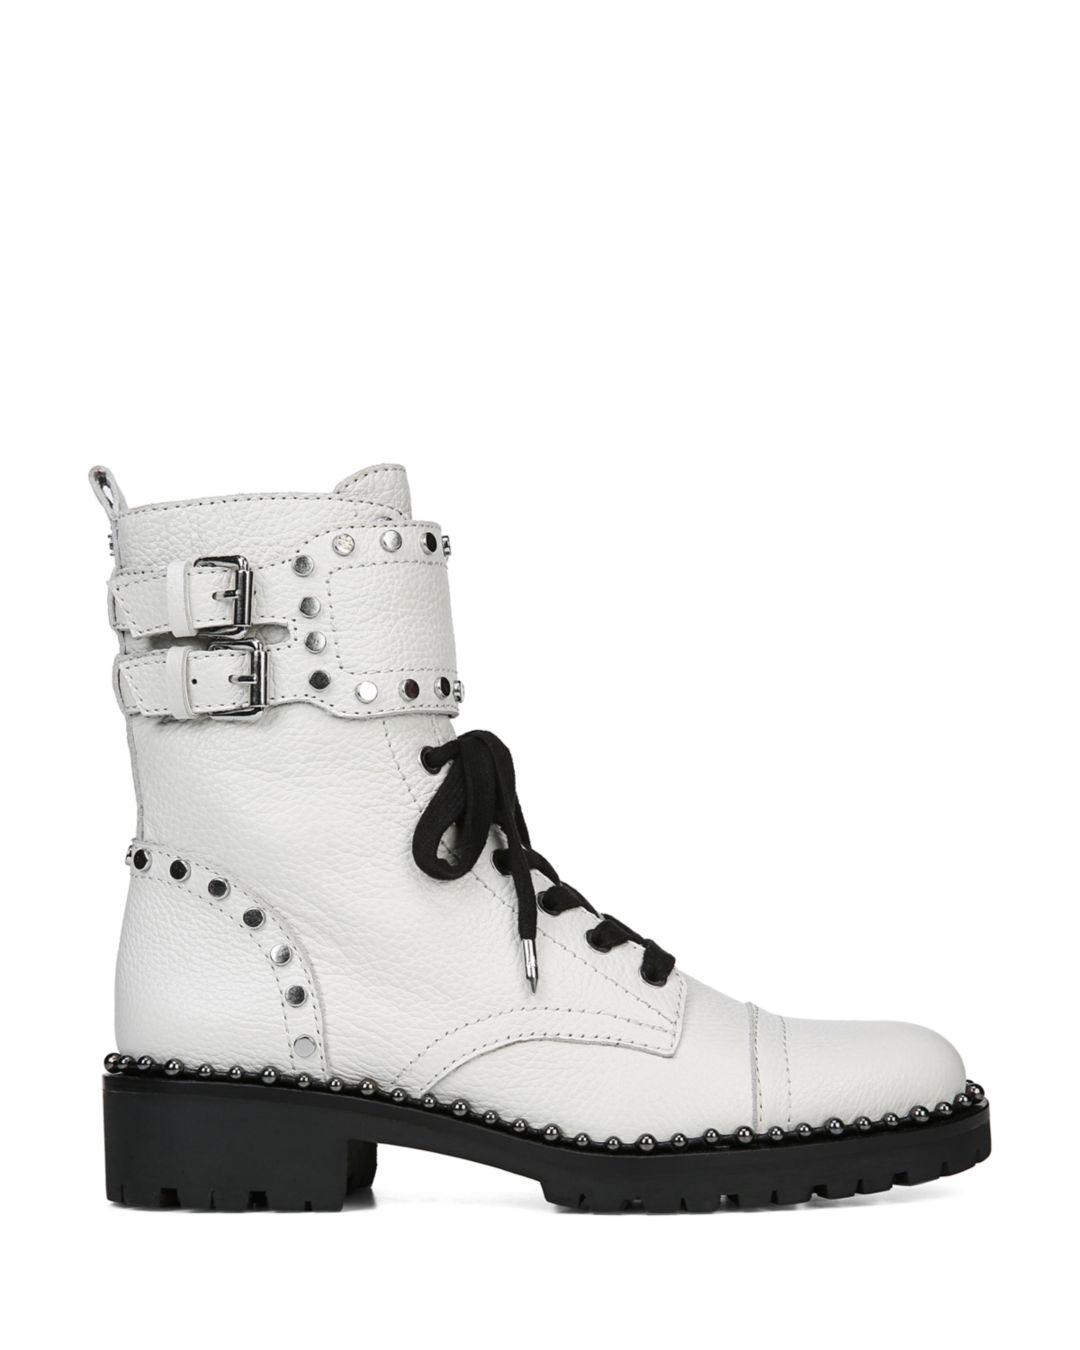 89edbcab8665b2 Lyst - Sam Edelman Jennifer Boot in White